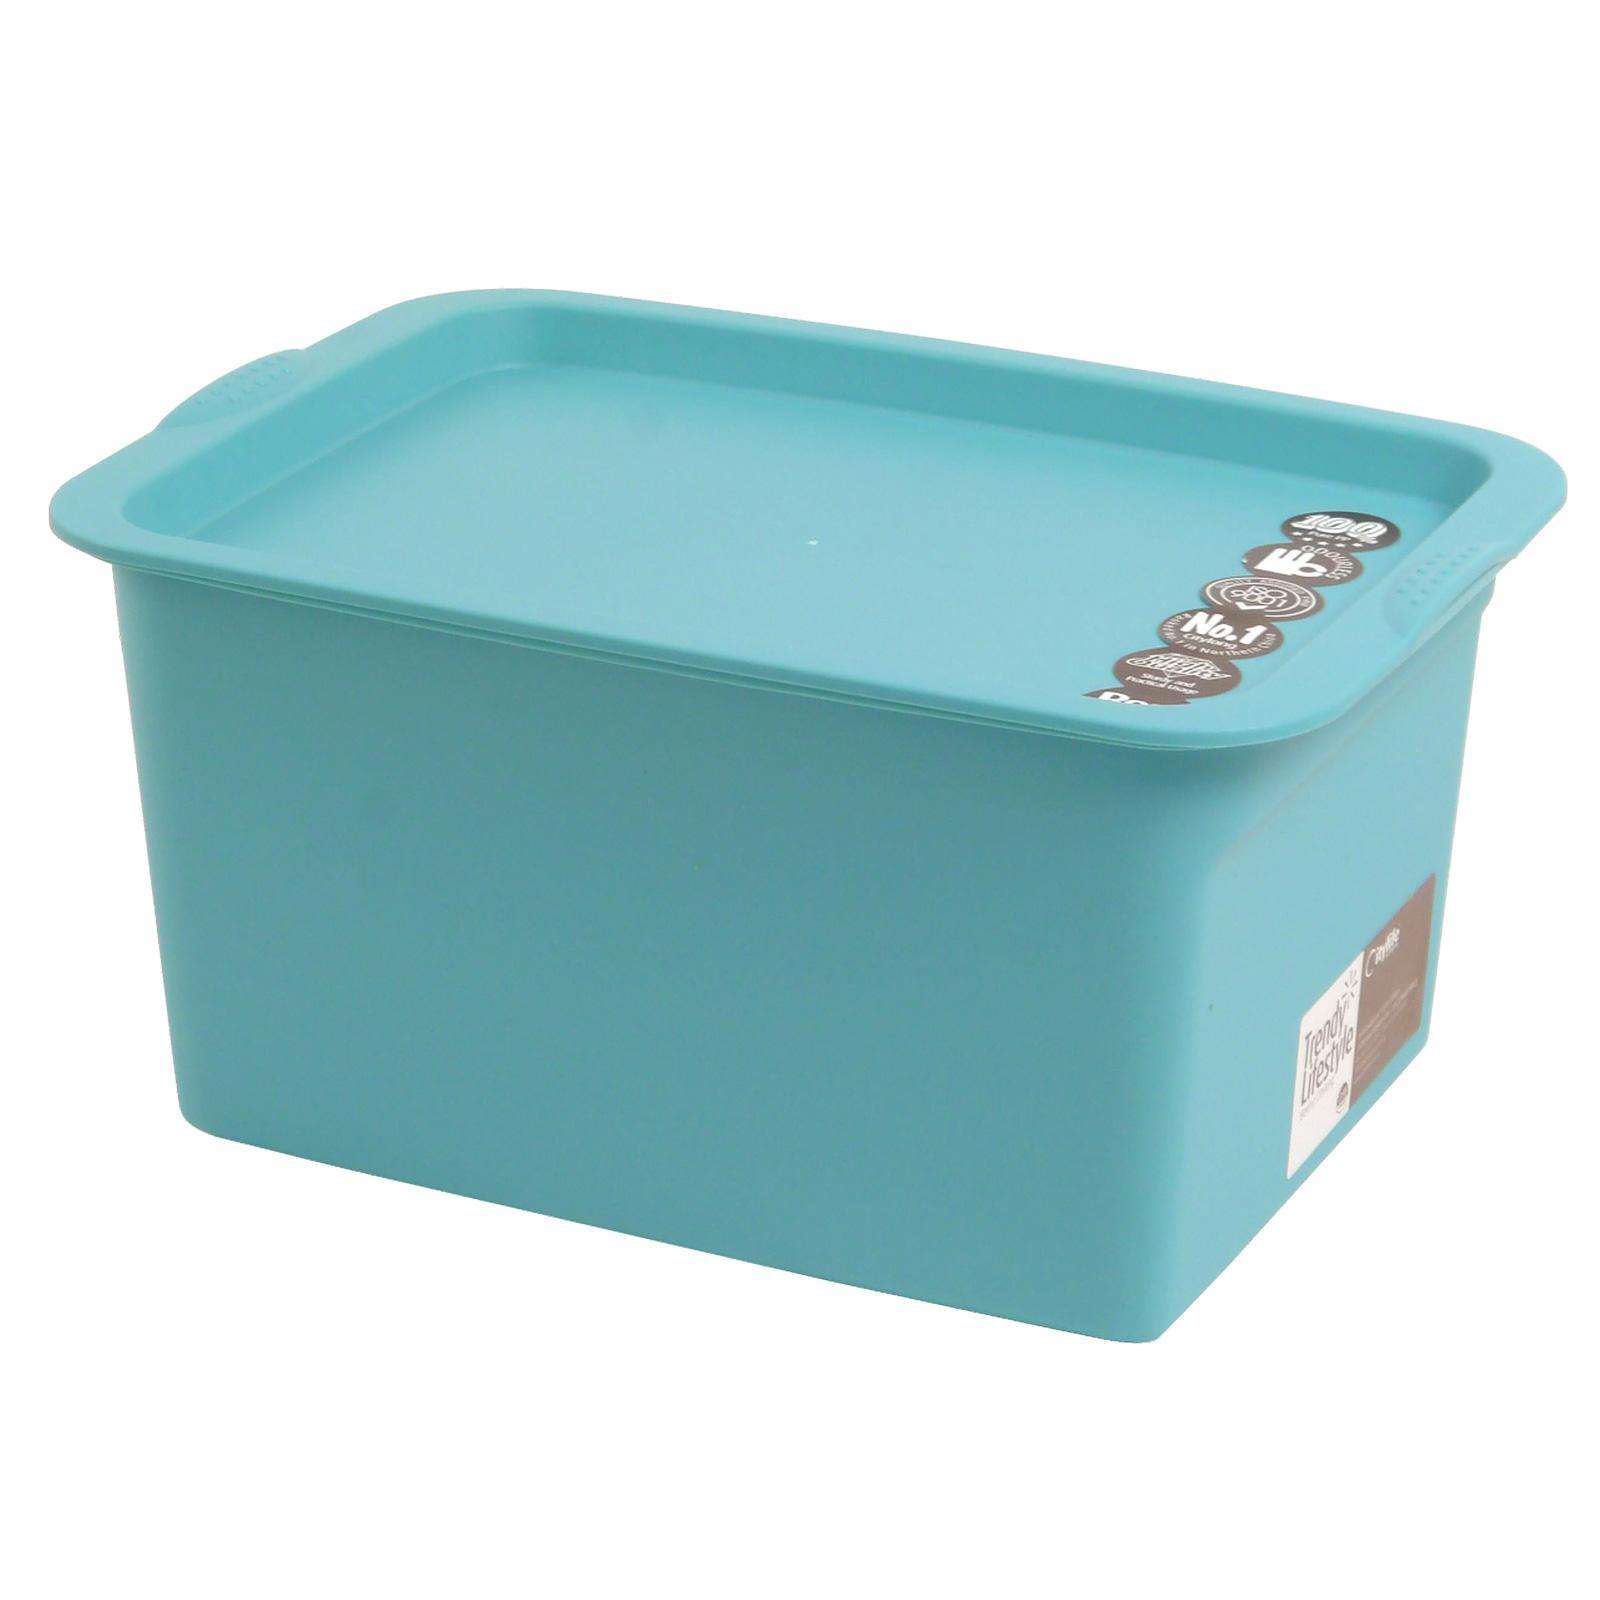 CITYLIFE Storage Box With Lid